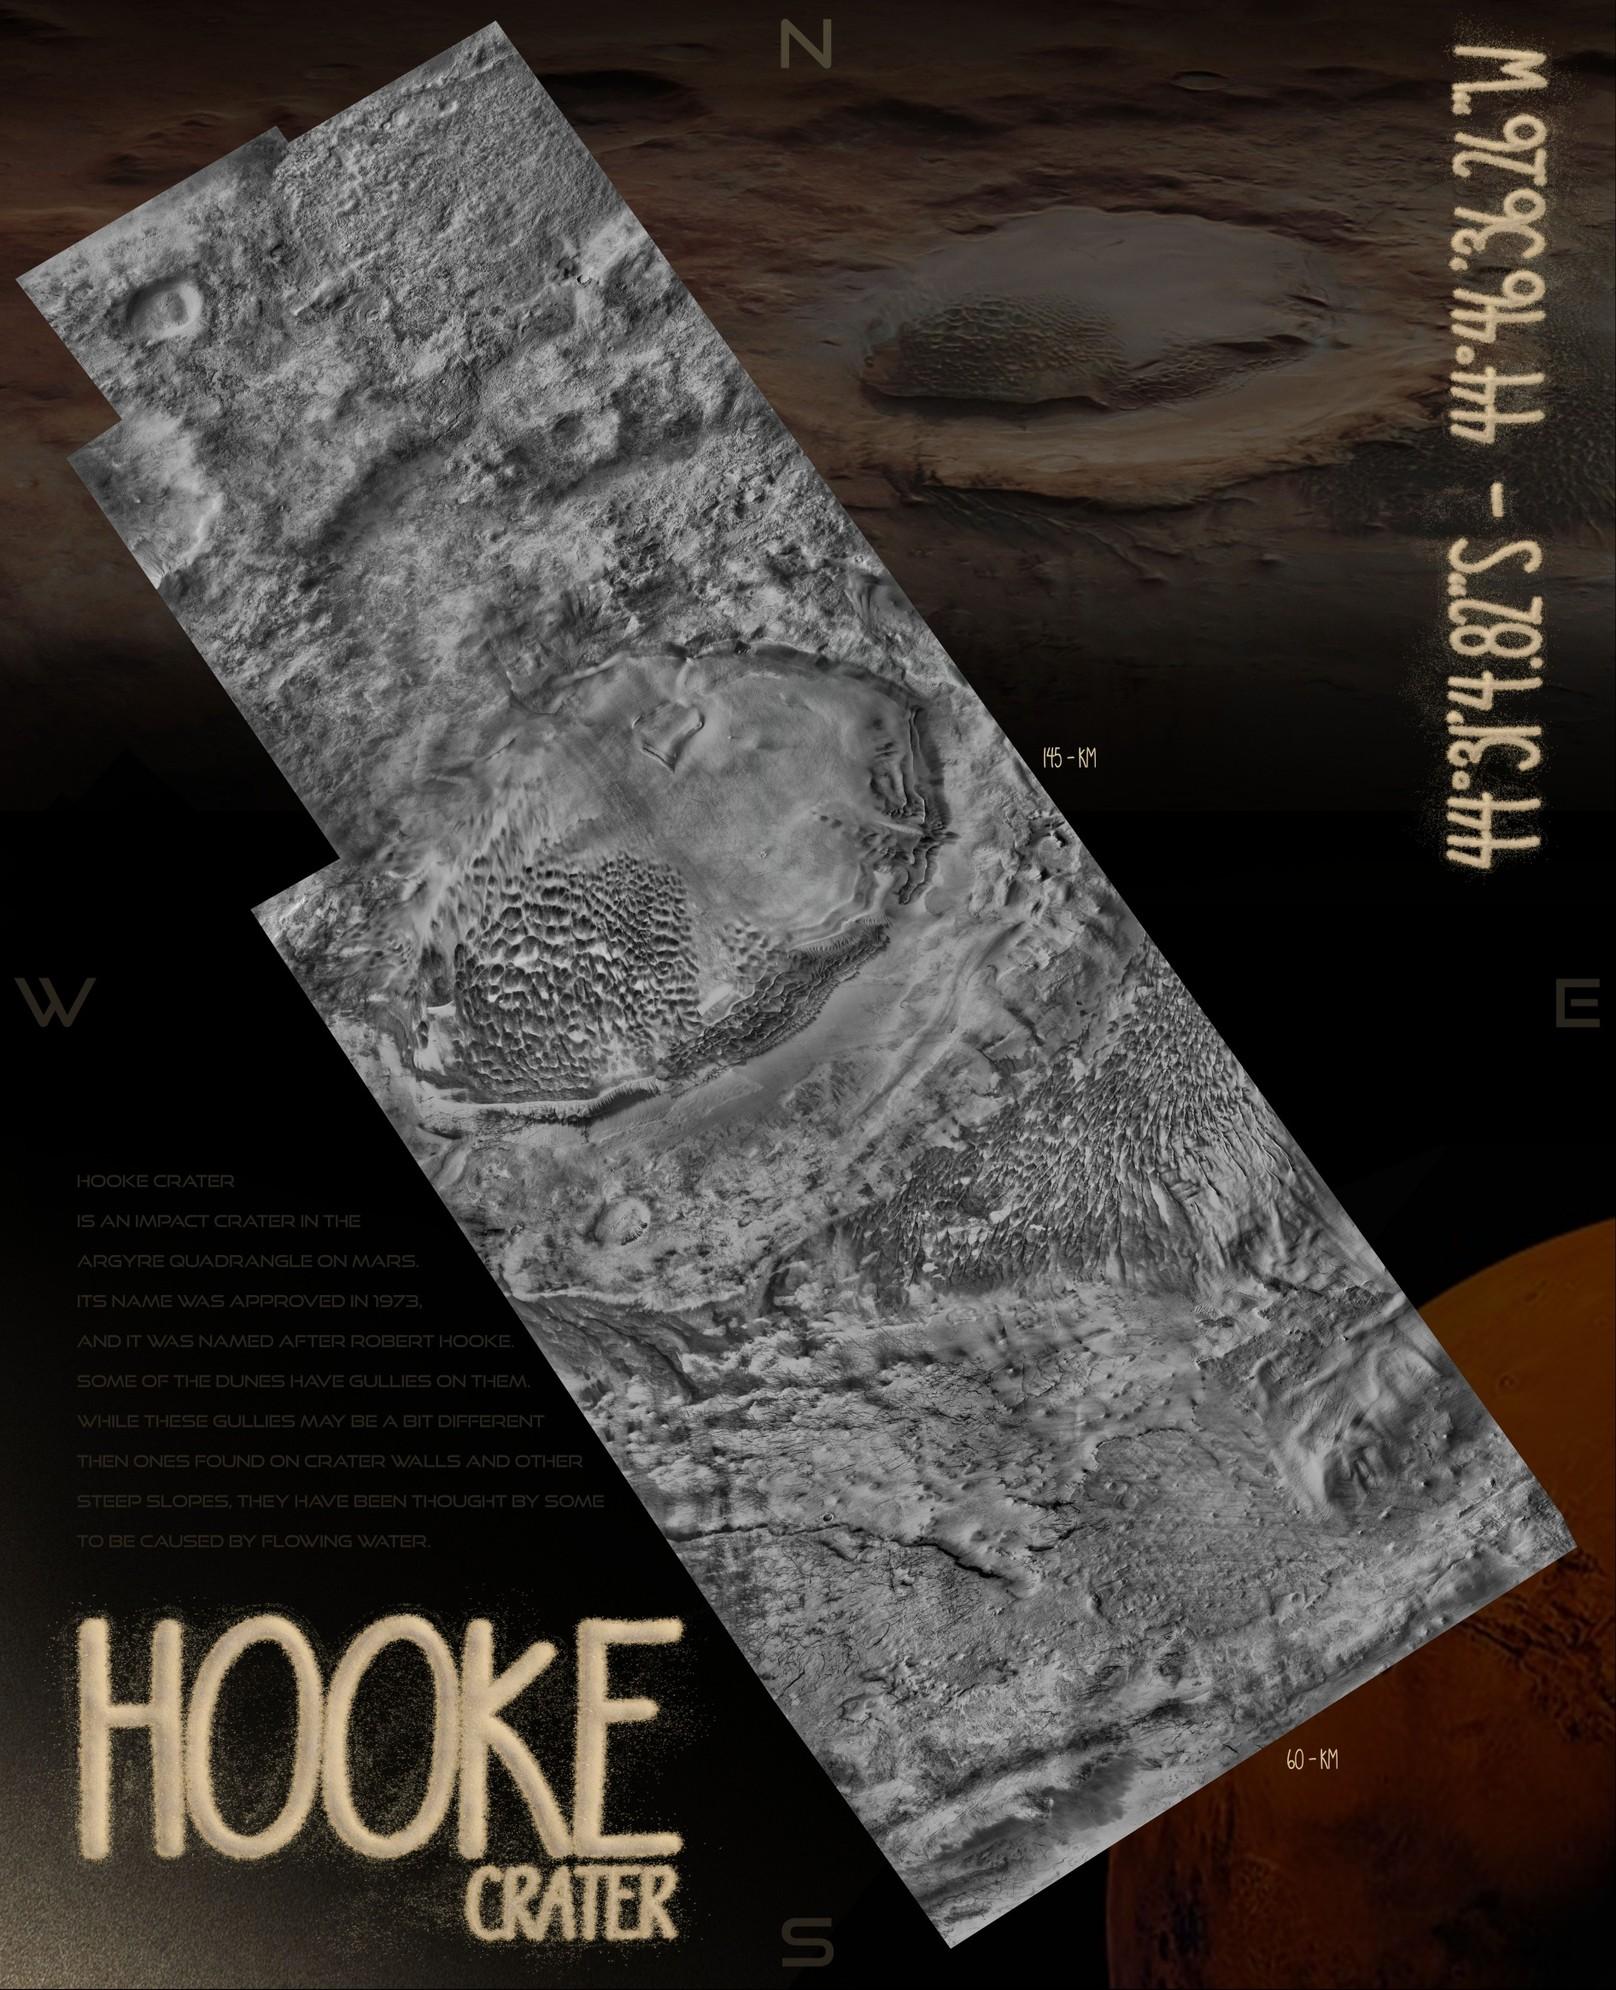 HOOKE CRATER